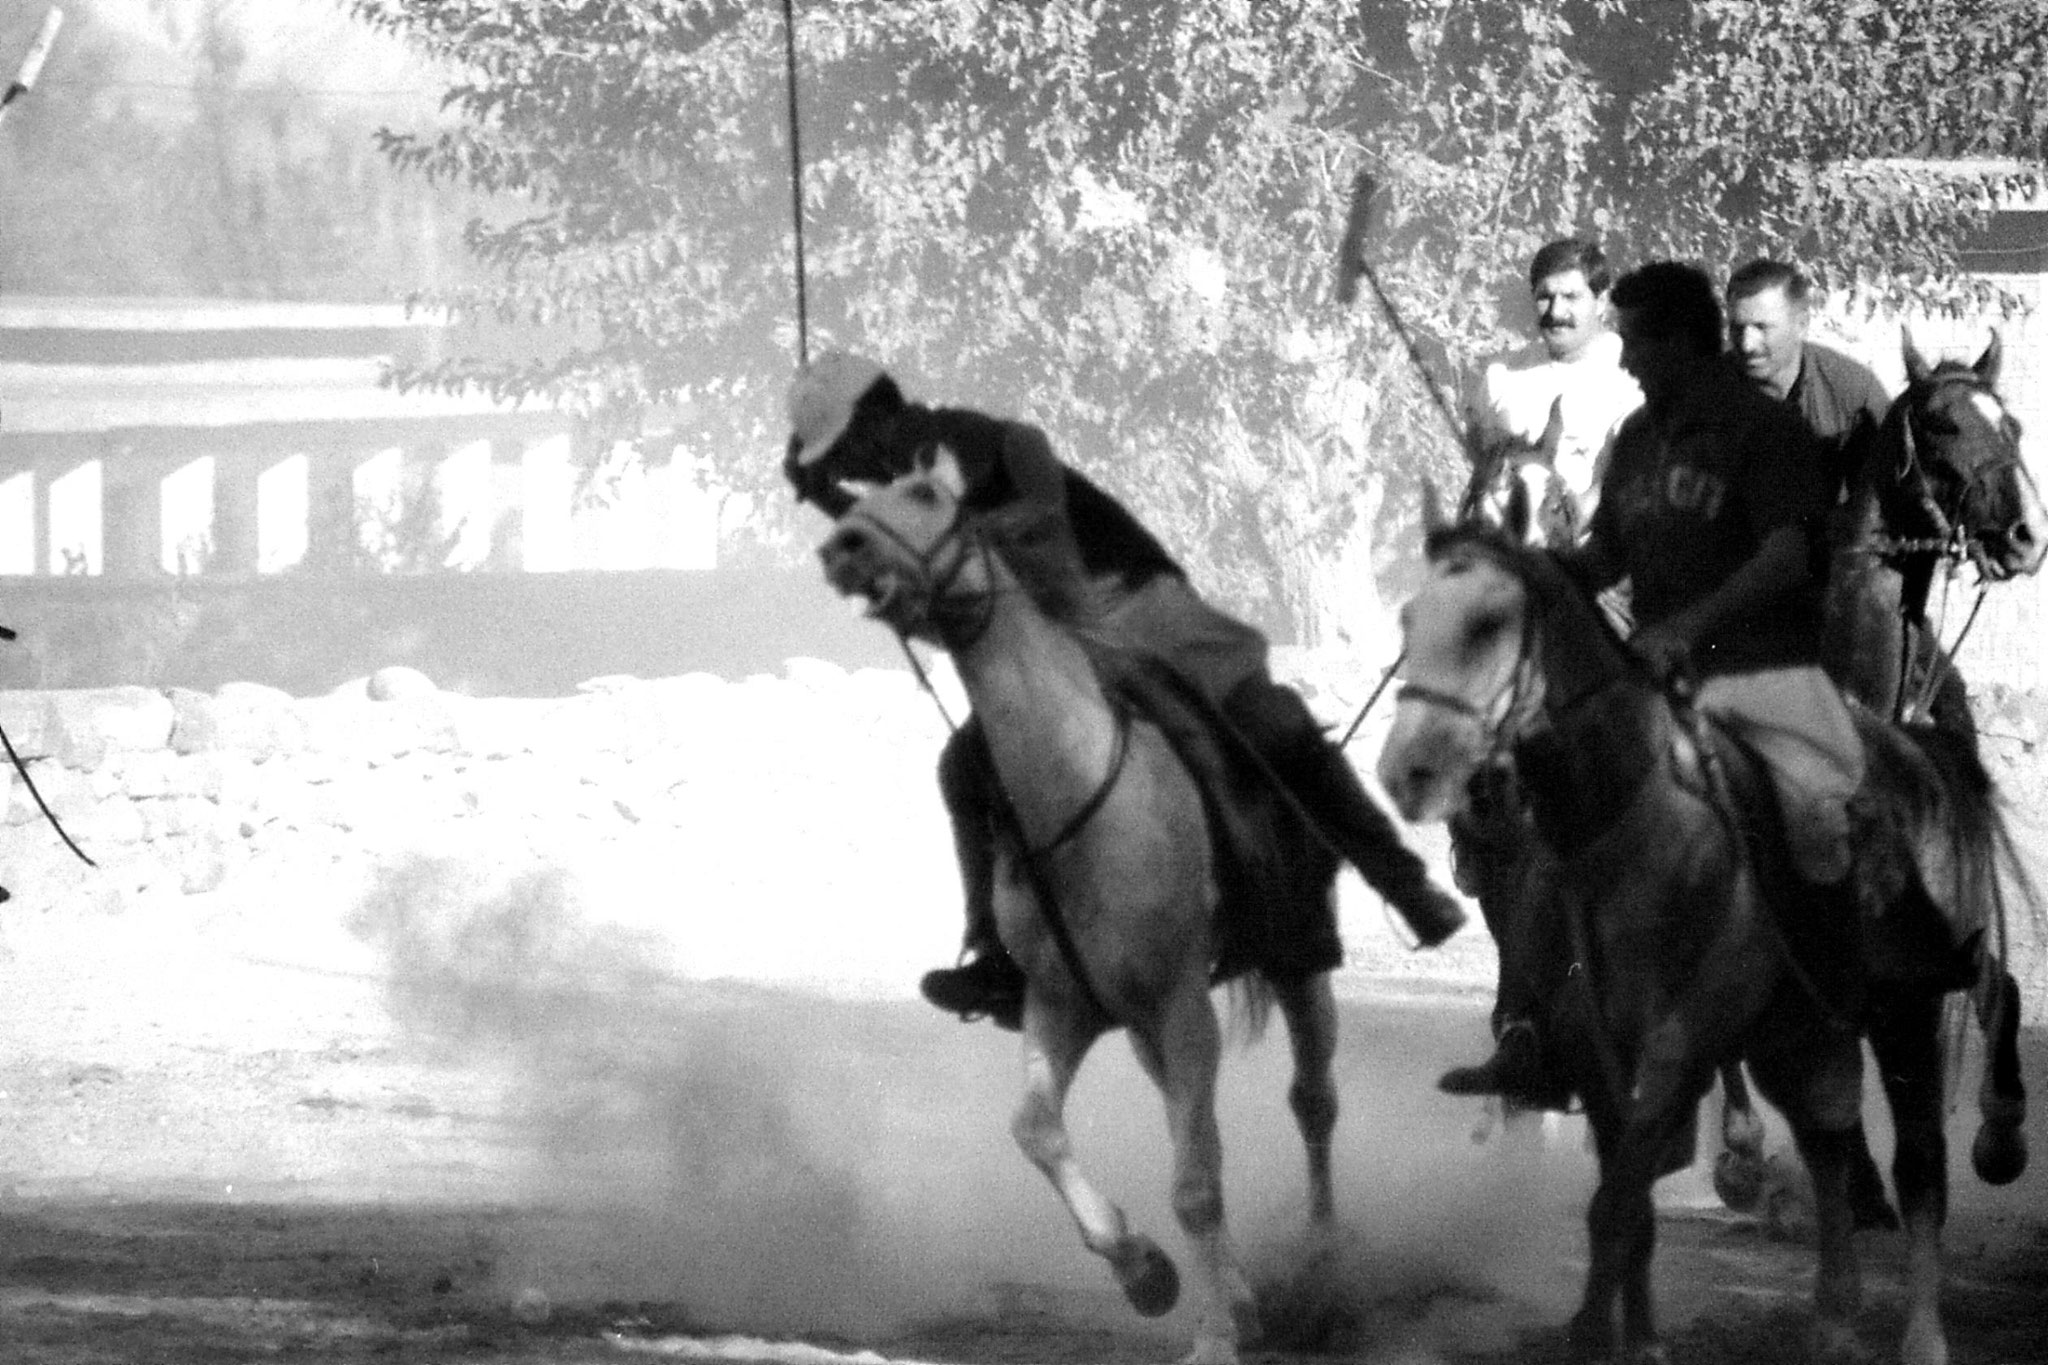 9/10/1989: 3: Gilgit polo match